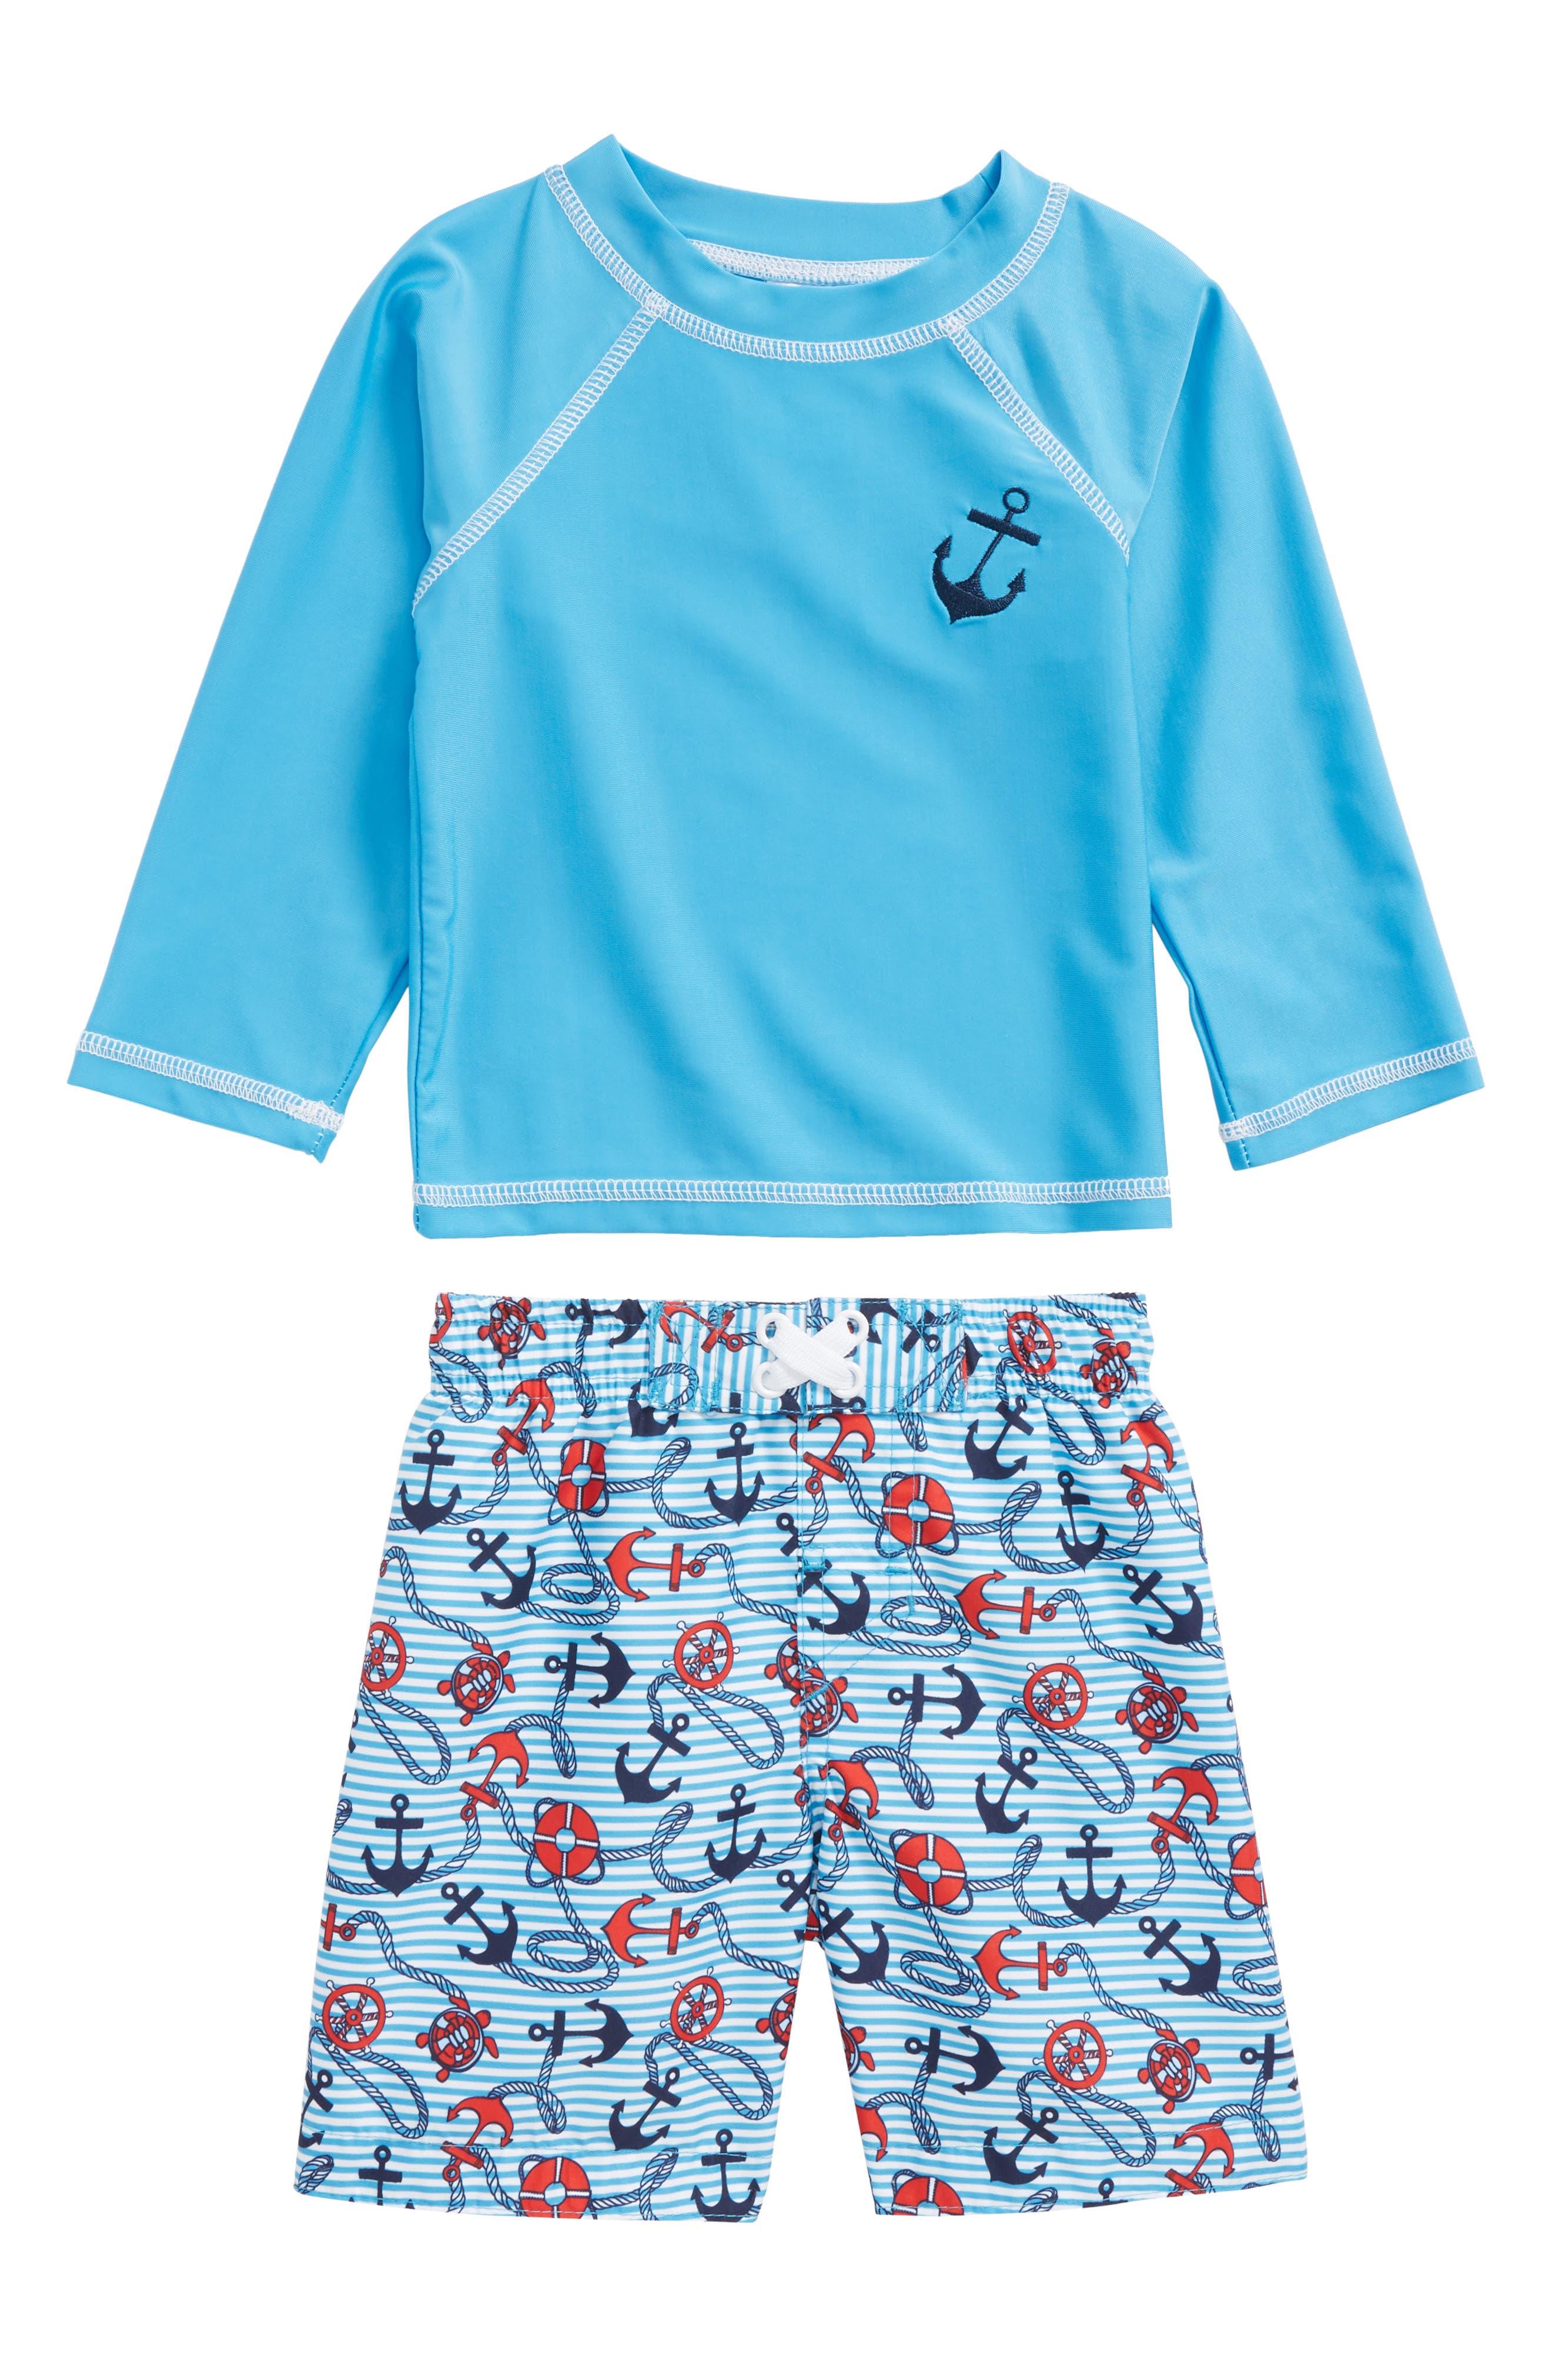 Beachy Nautical Two-Piece Rashguard Swimsuit,                         Main,                         color, Blue Multi